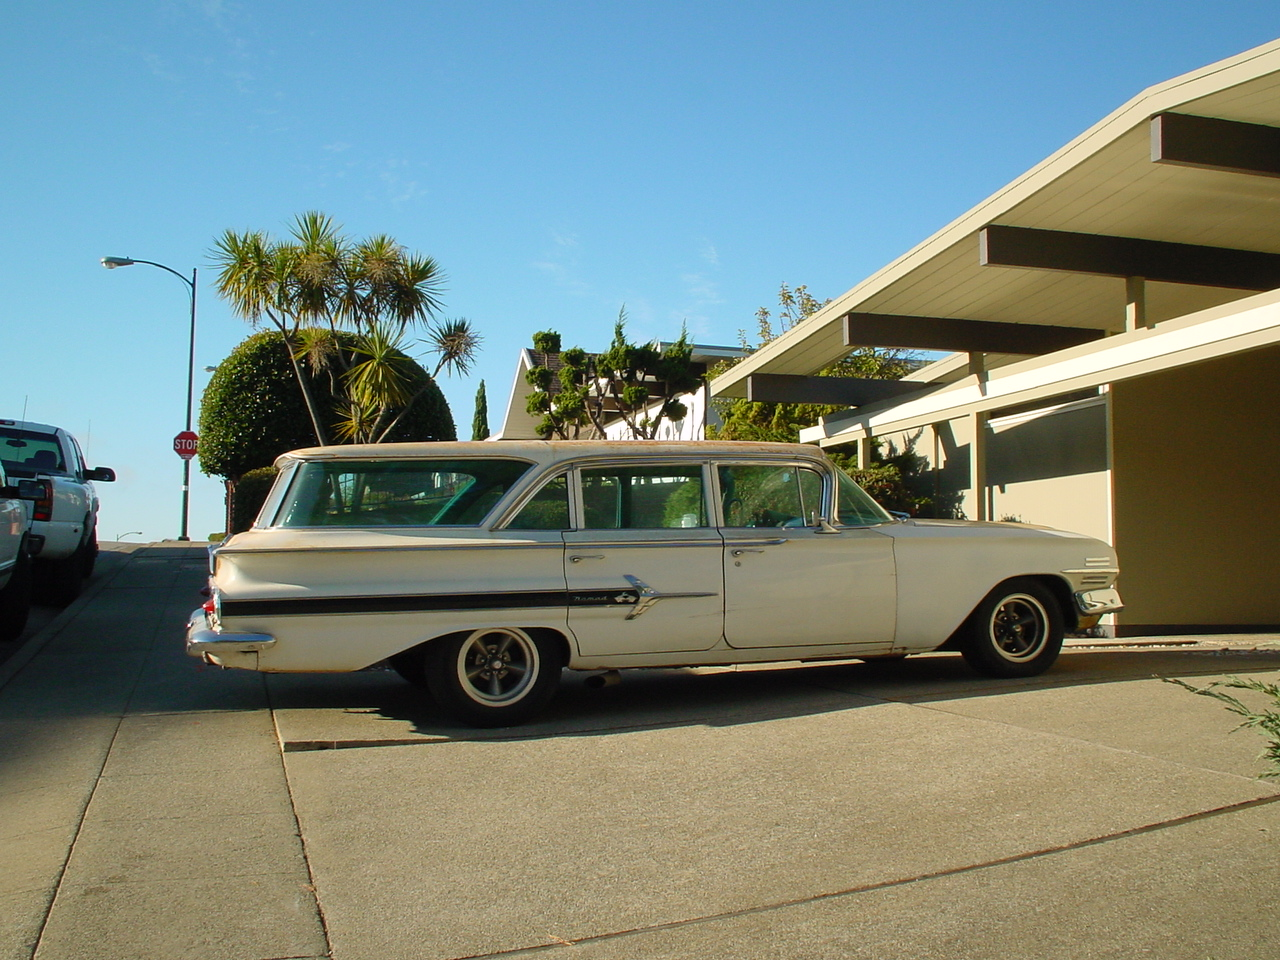 1960 Chevy Nomad Station Wagon